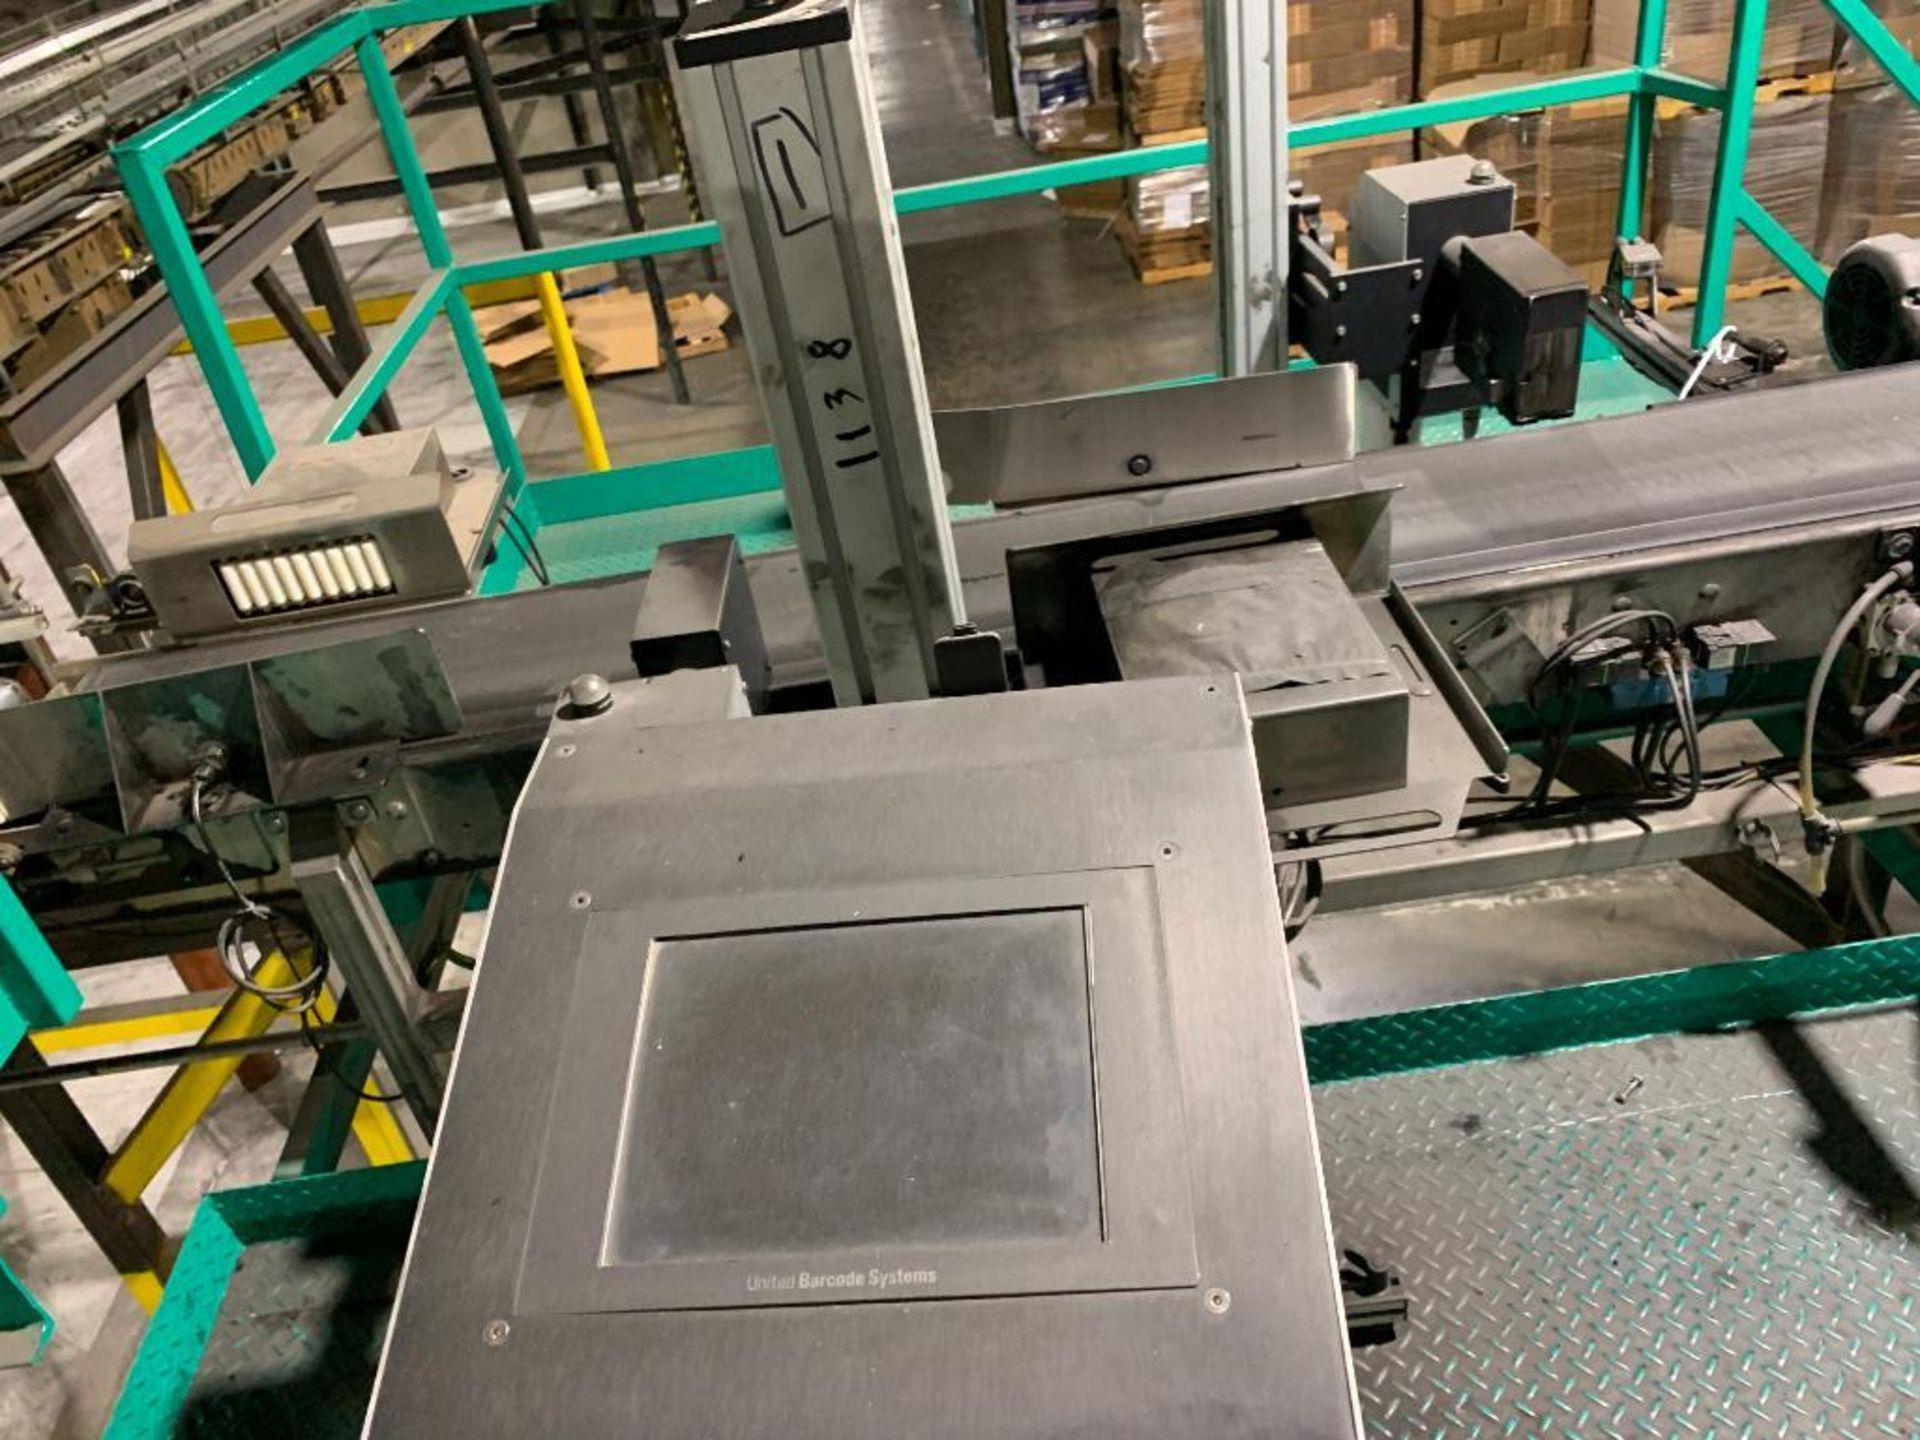 BMI stainless steel conveyor - Image 14 of 14